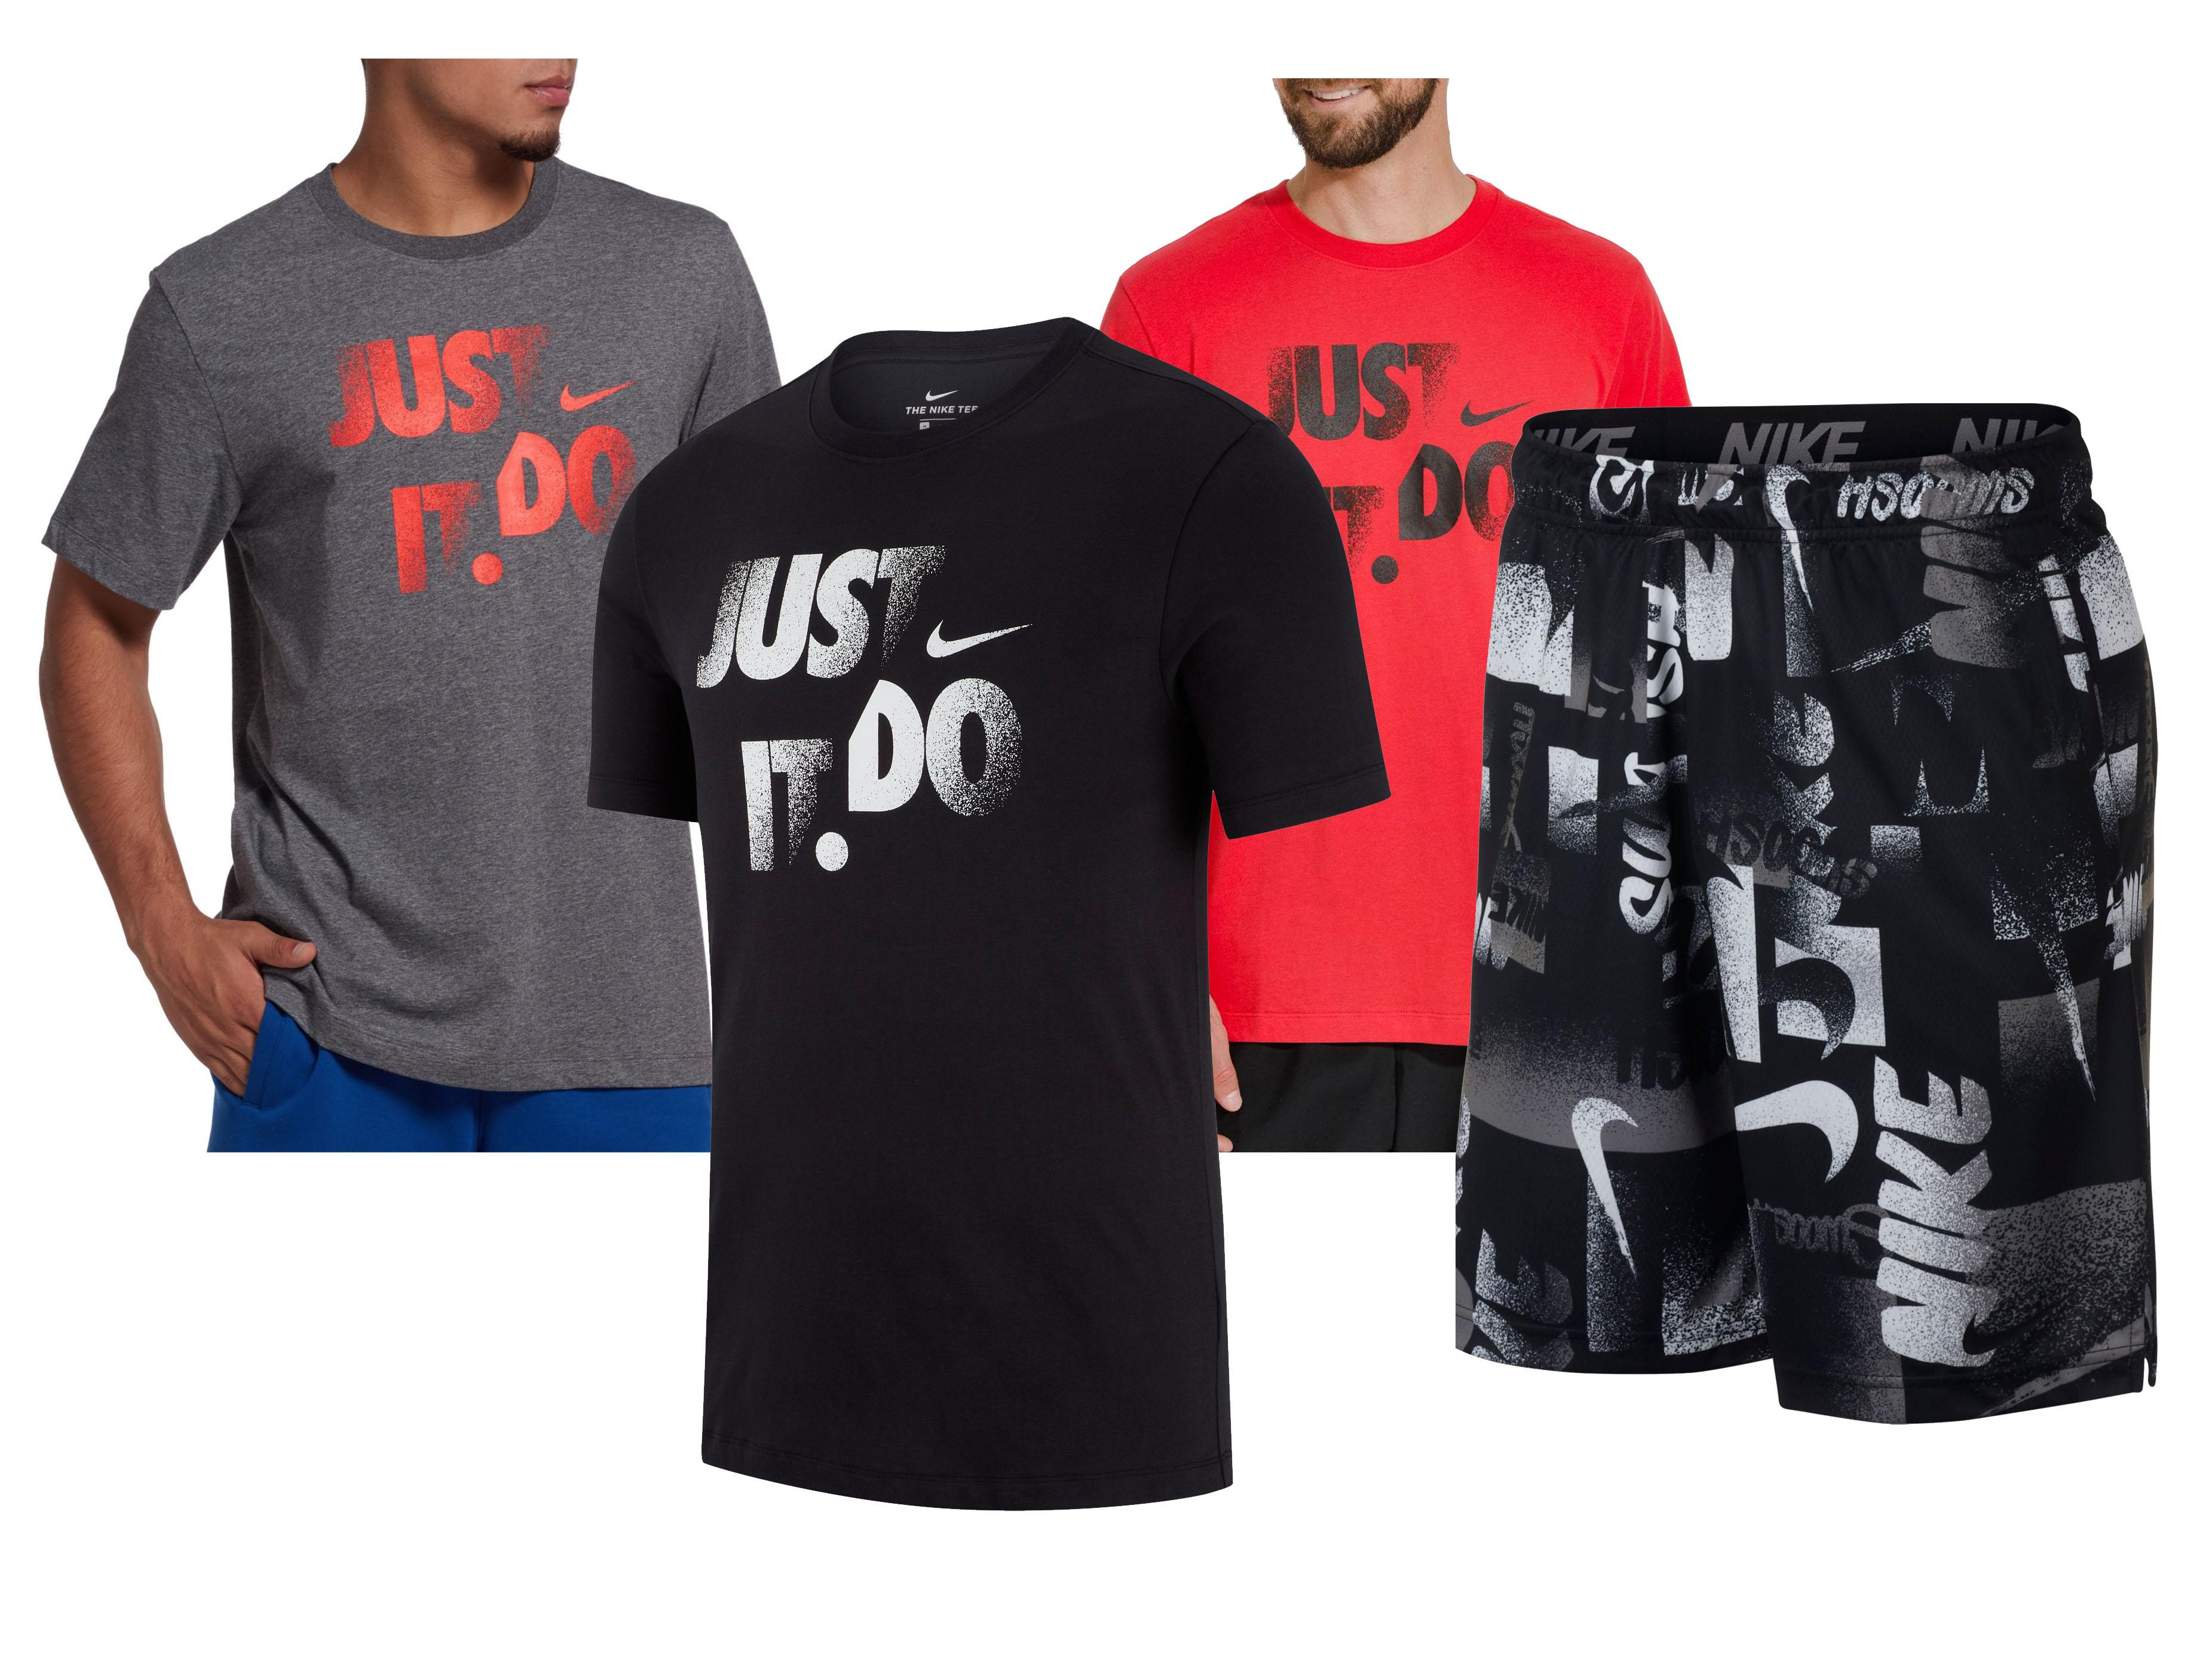 Nike Men's: Dry Print Shorts + 3-Ct Dri-Fit Graphic Tees $40.88 + Free Shipping ($10.22 each)